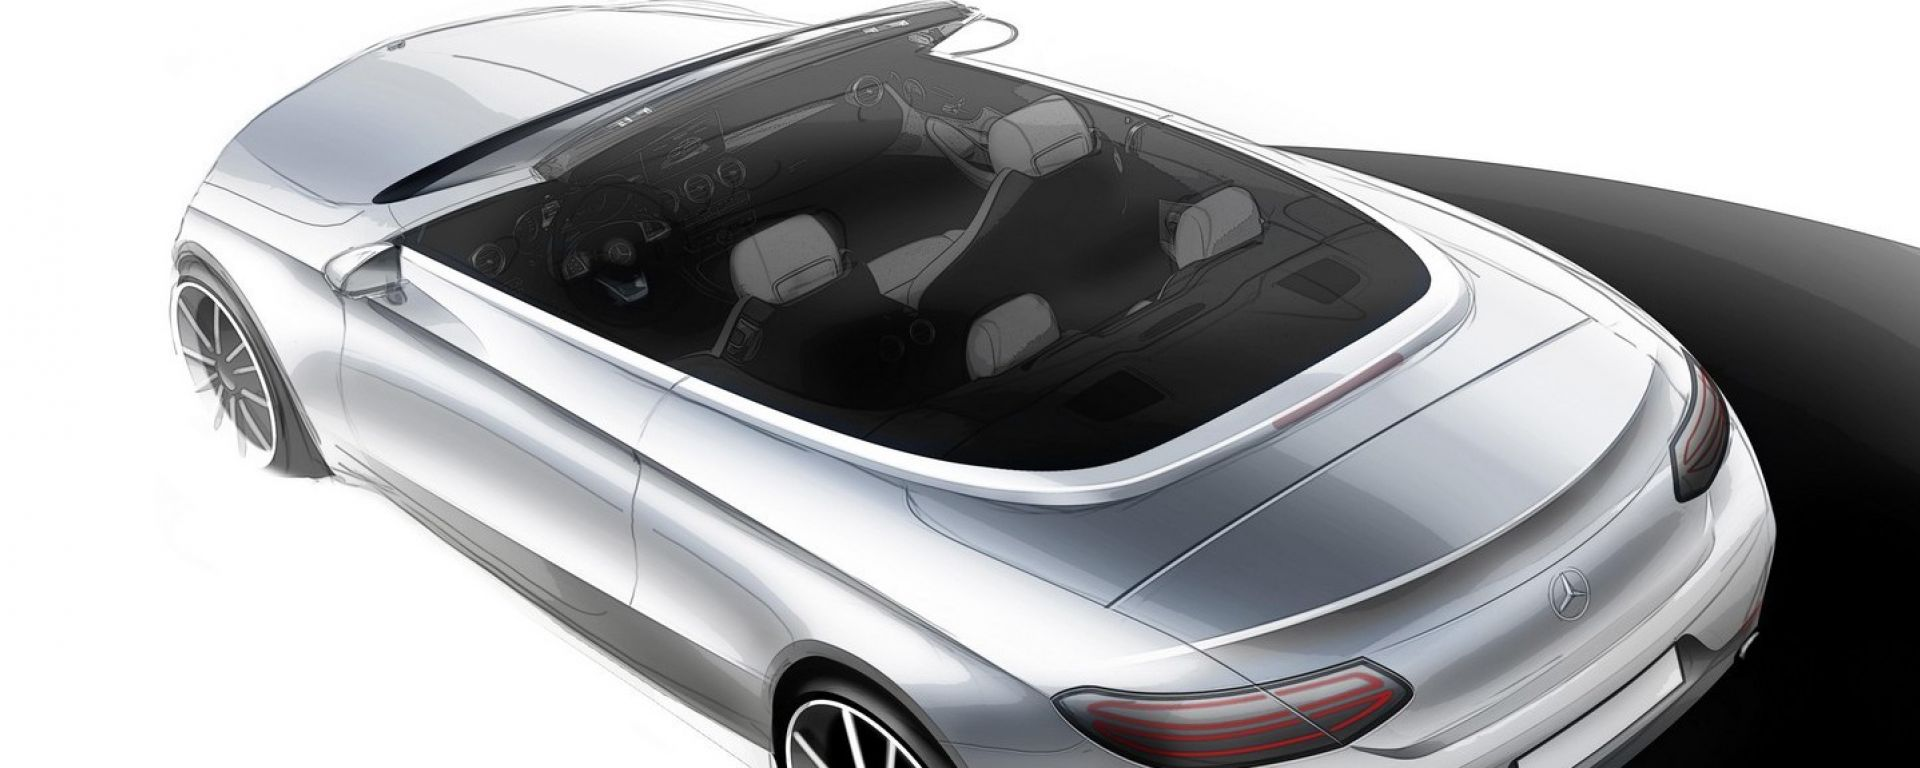 Mercedes Classe C Cabriolet: il primo sketch